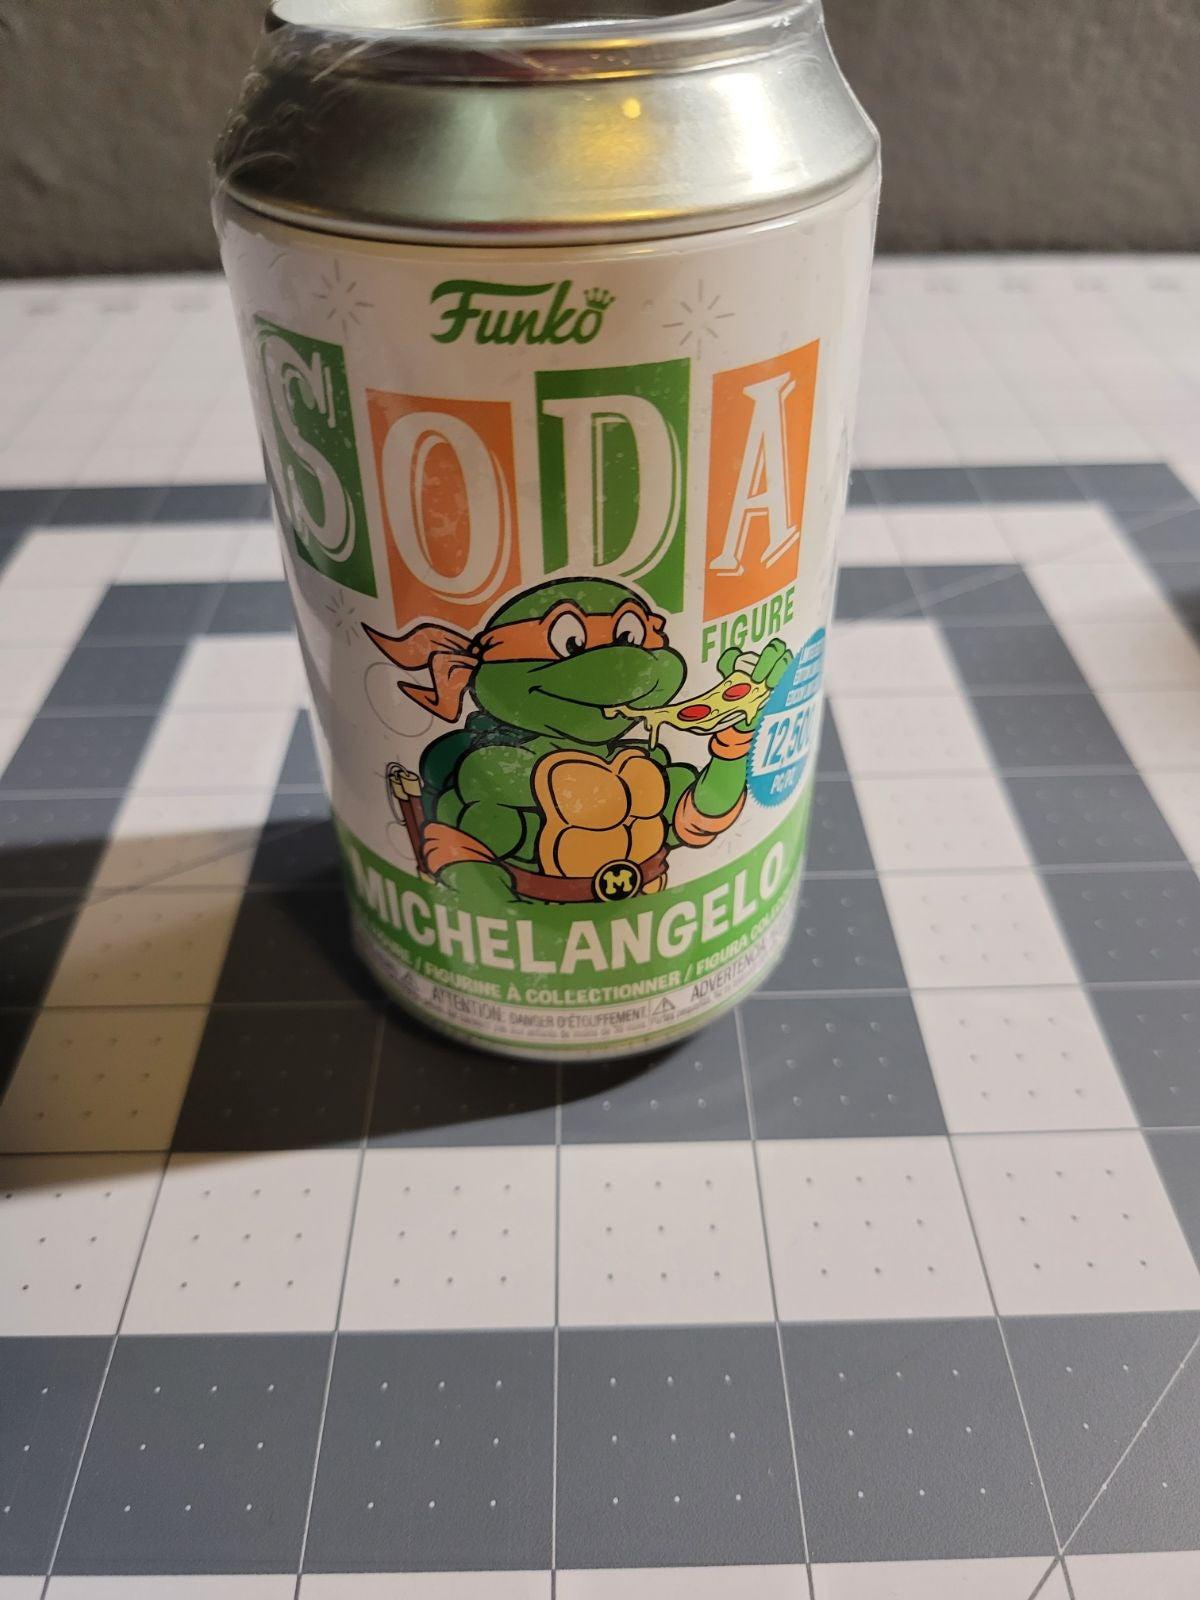 Funko Soda Sealed Michelangelo TMNT